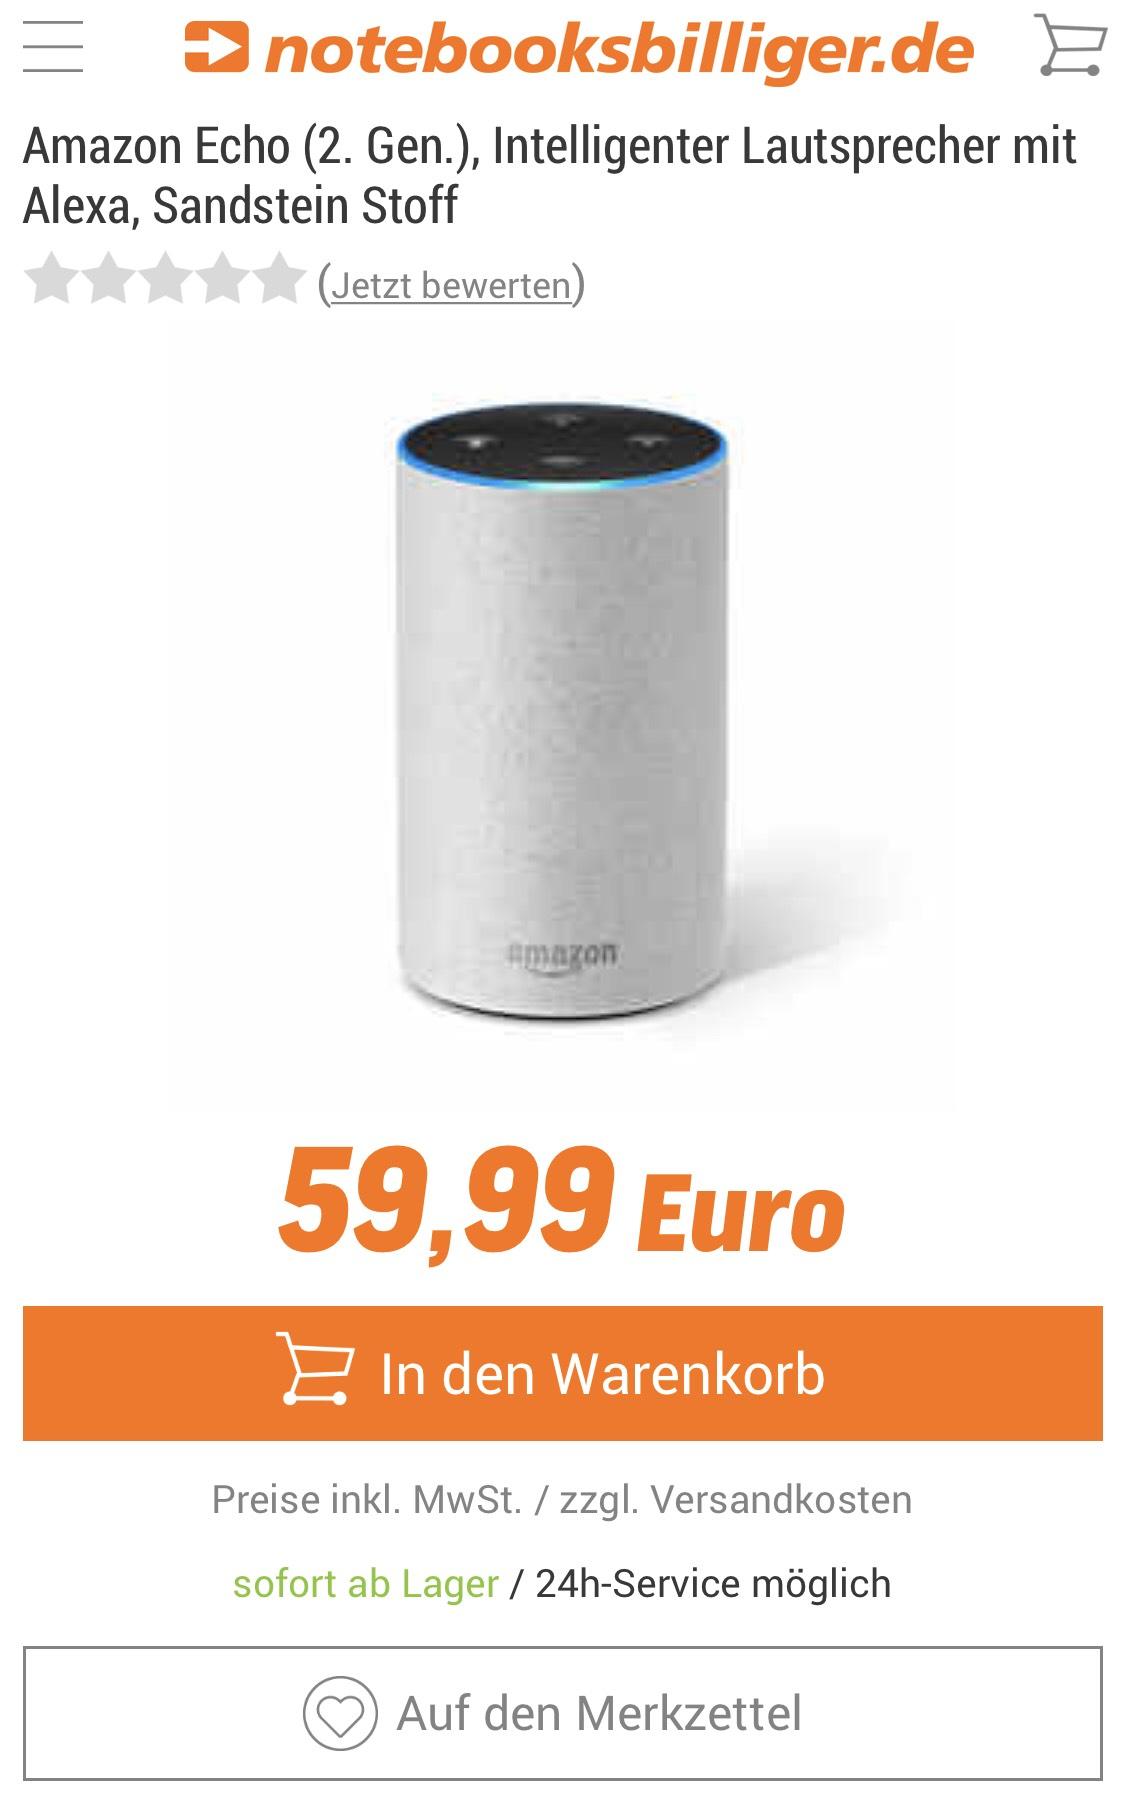 [NBB] Amazon Echo (2. Gen.) Sandstein Stoff 63,98€ inkl. Versand